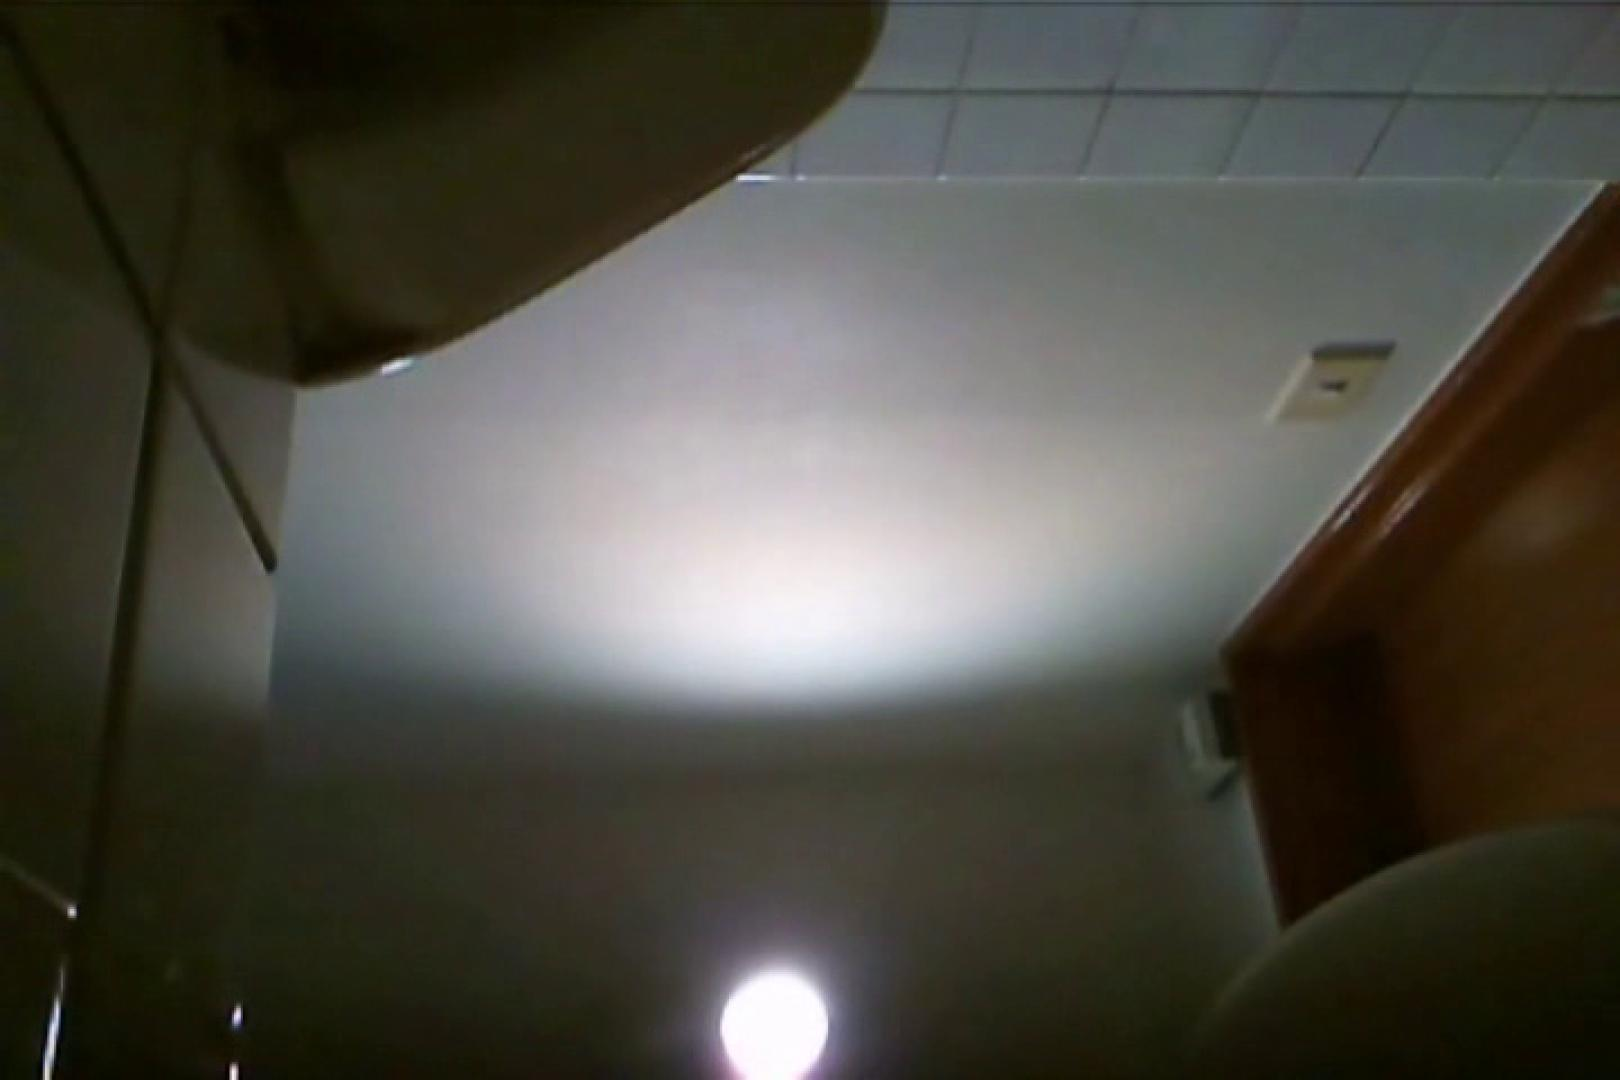 SEASON 2ND!掴み取りさんの洗面所覗き!in新幹線!VOL.03 サル系な男たち ゲイアダルト画像 84連発 68